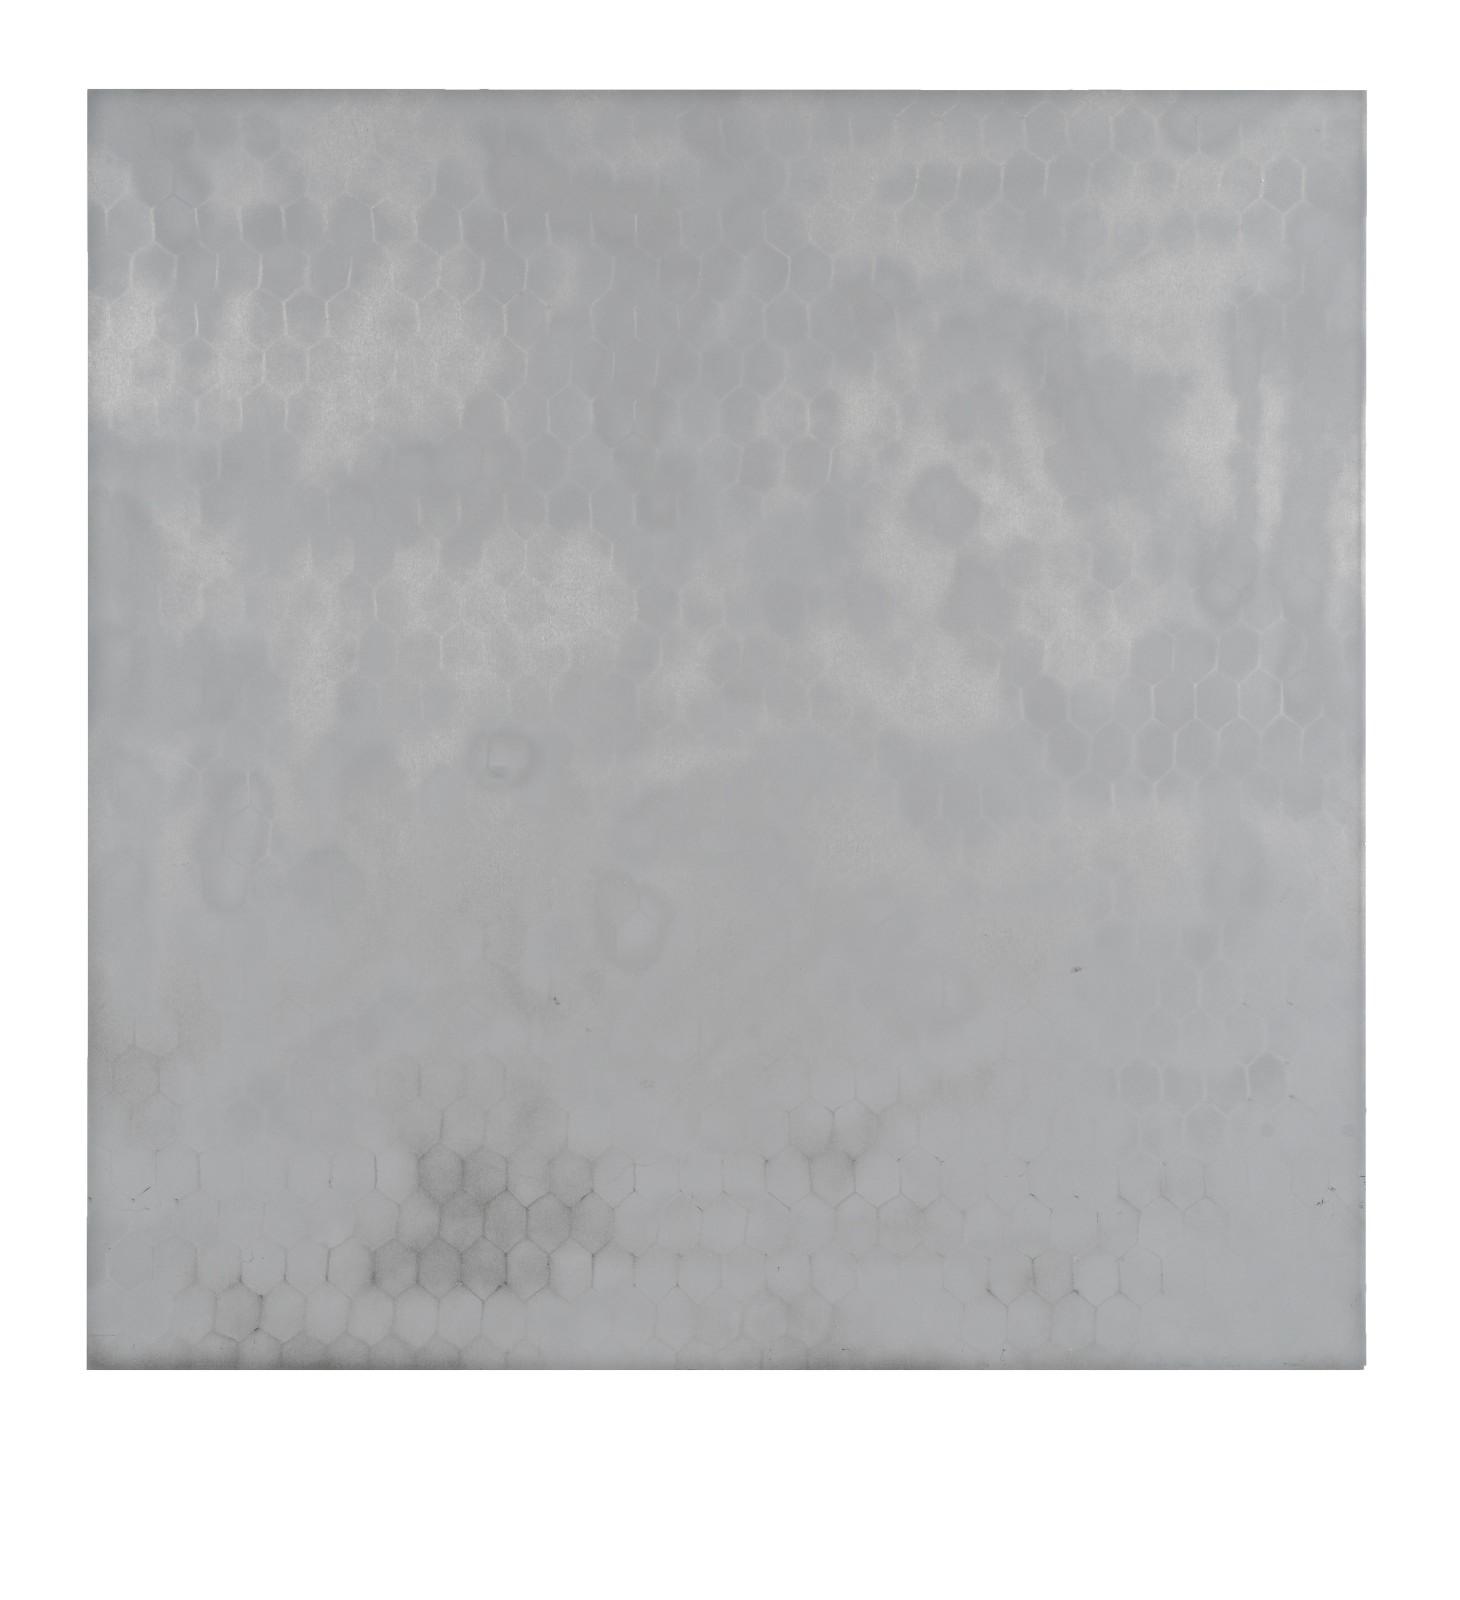 "STAIN : 40°42'49.1""N 73°56'03.5""W, 2015, spraypaint on aluminium, 81,3 x 81,3 cm"